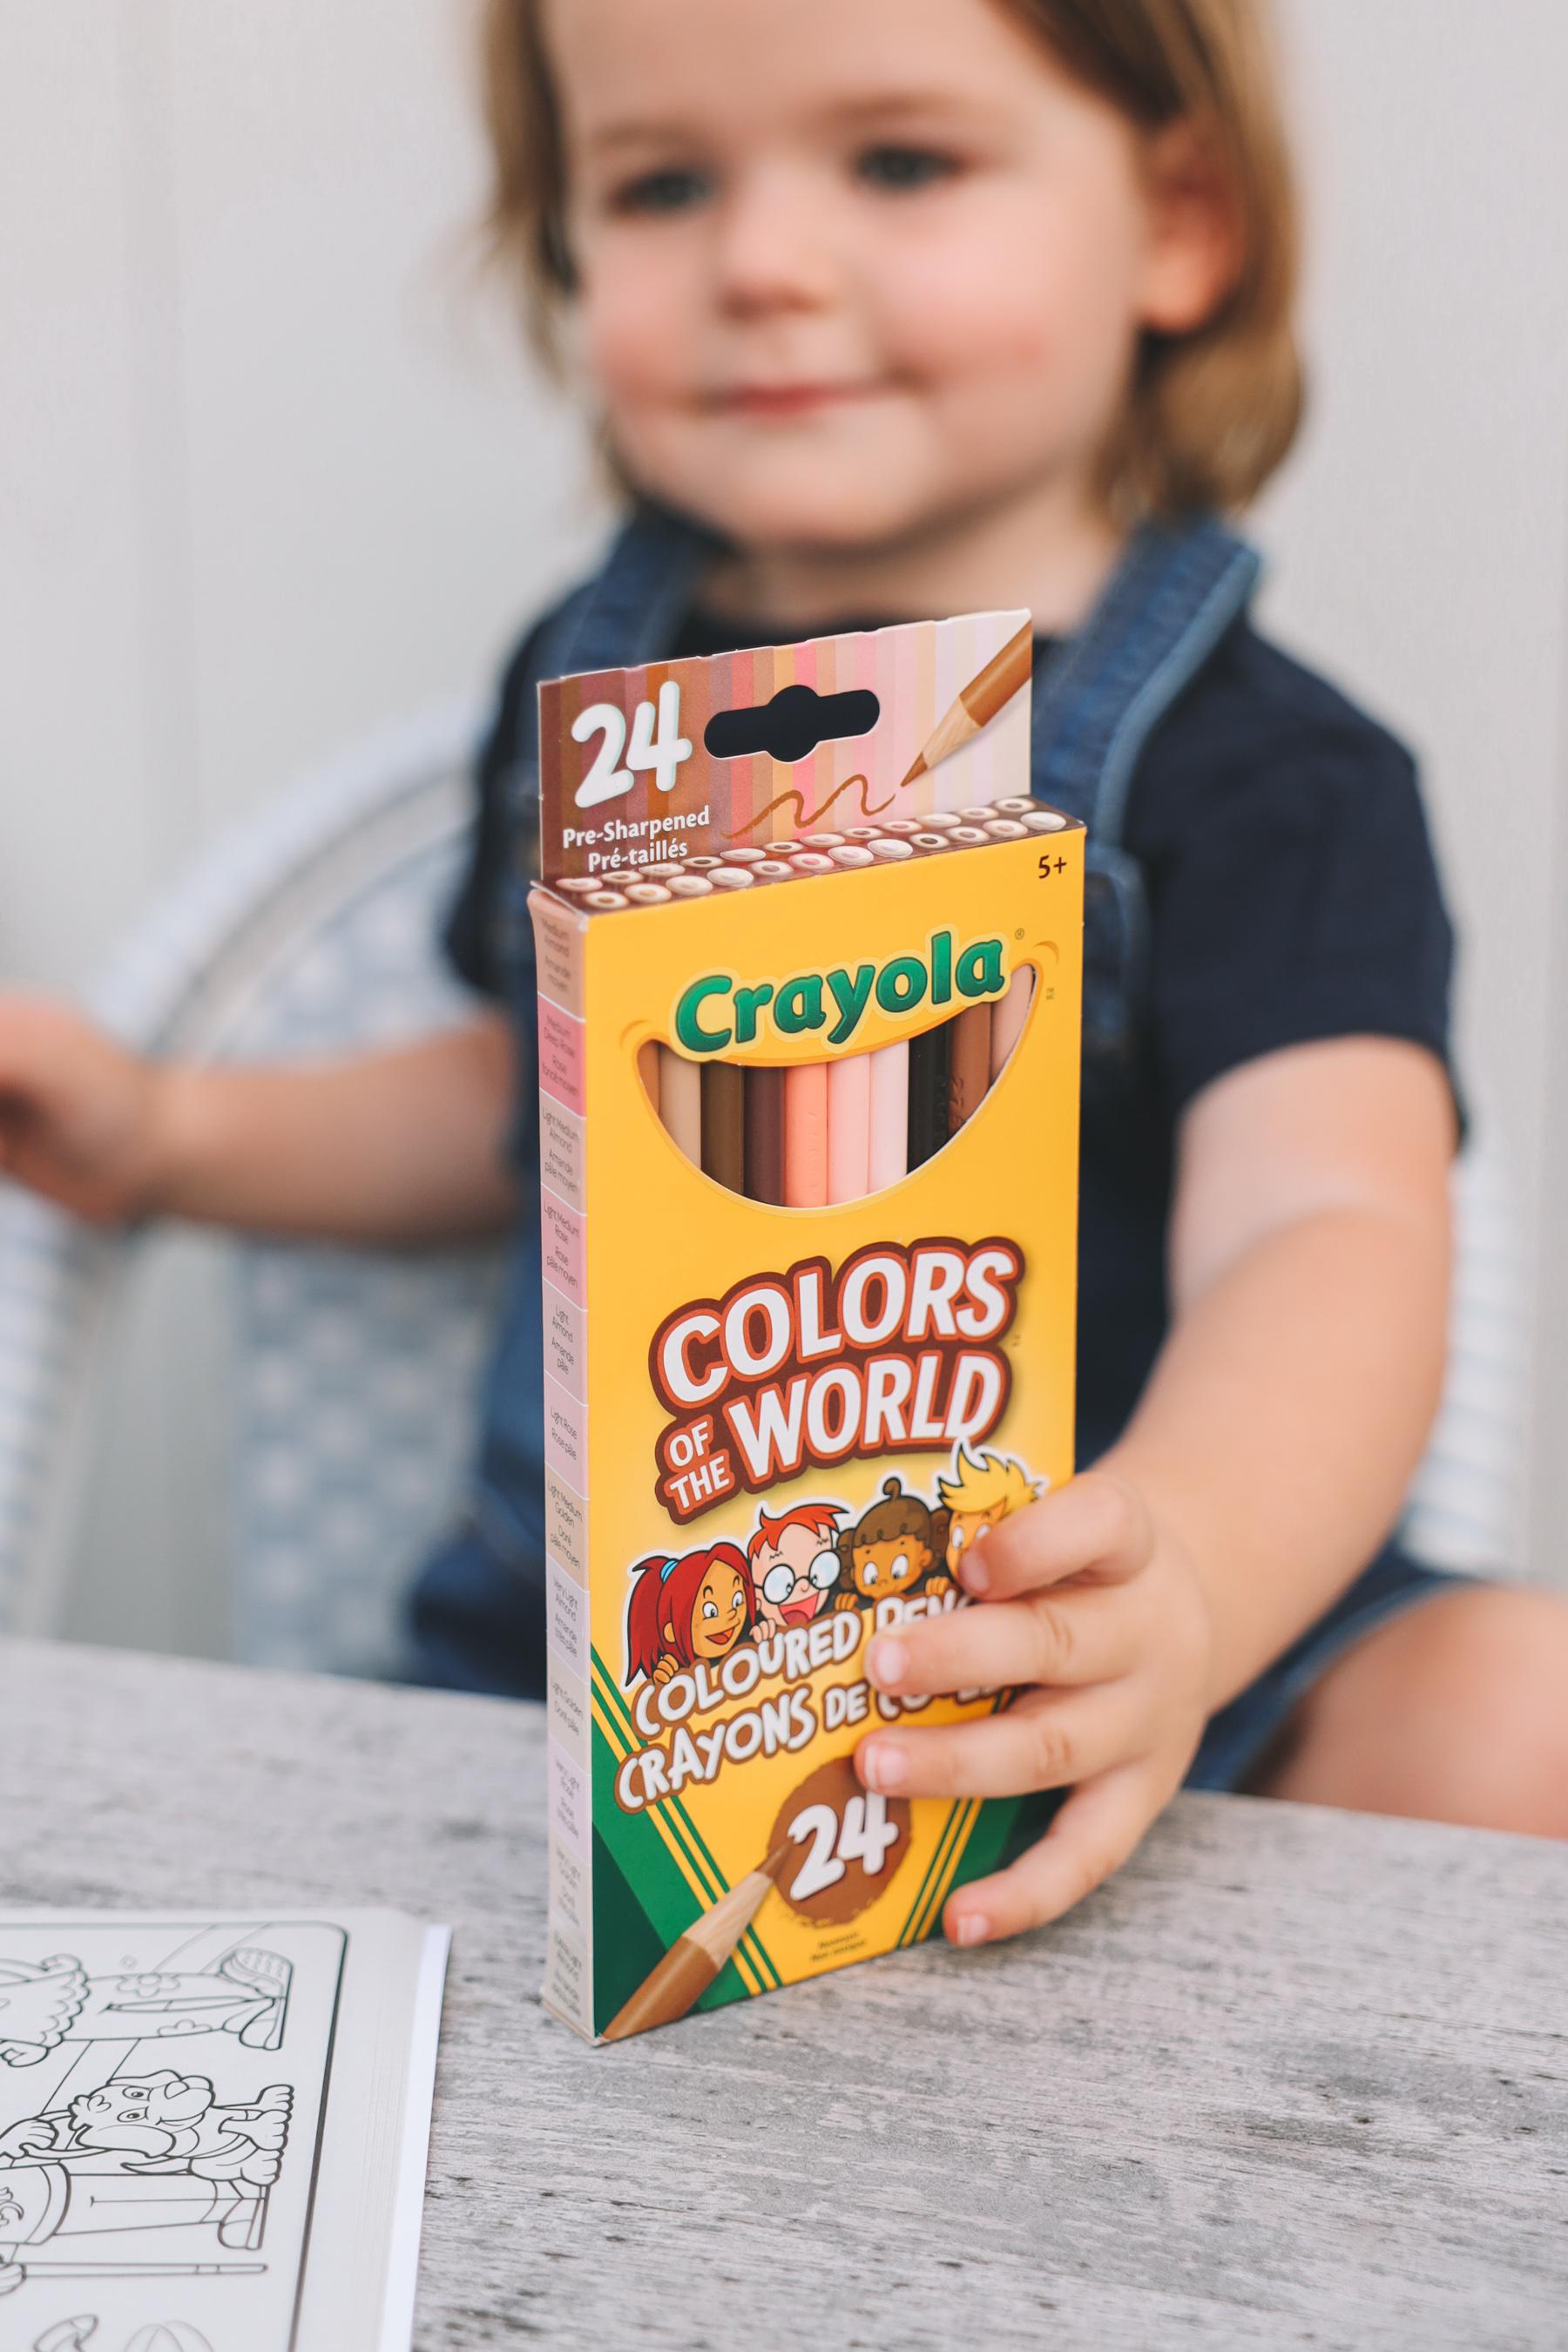 Crayola Colors of the World Walmart